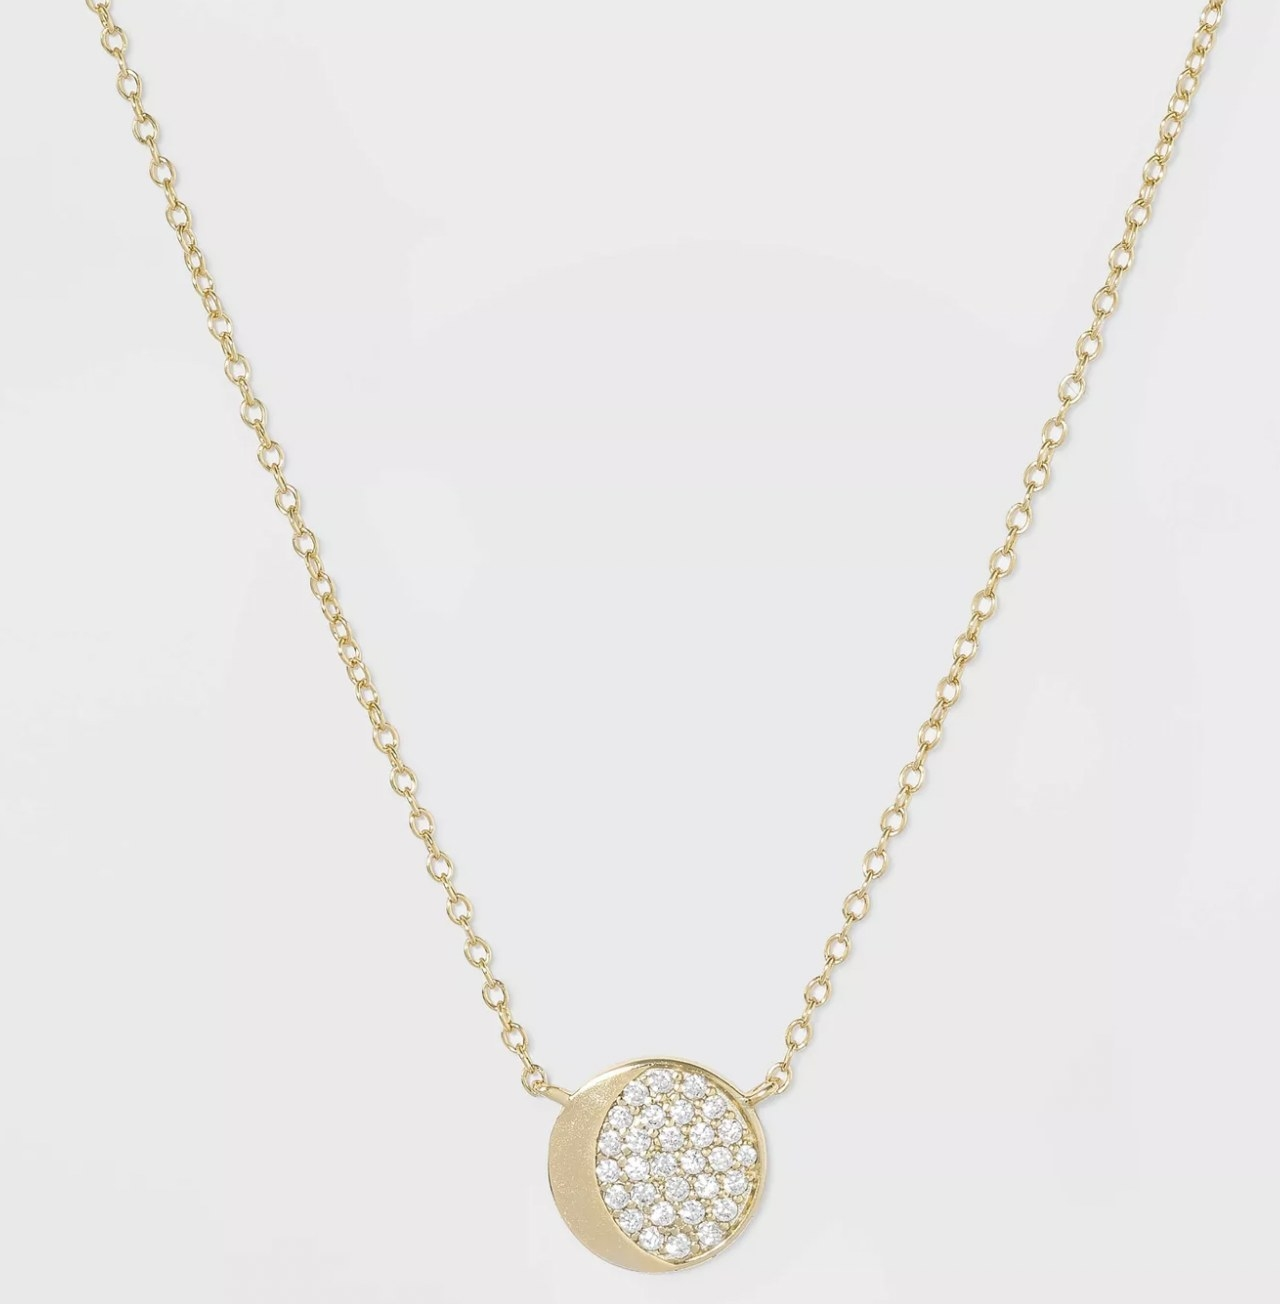 A half-moon necklace with cubic zirconia